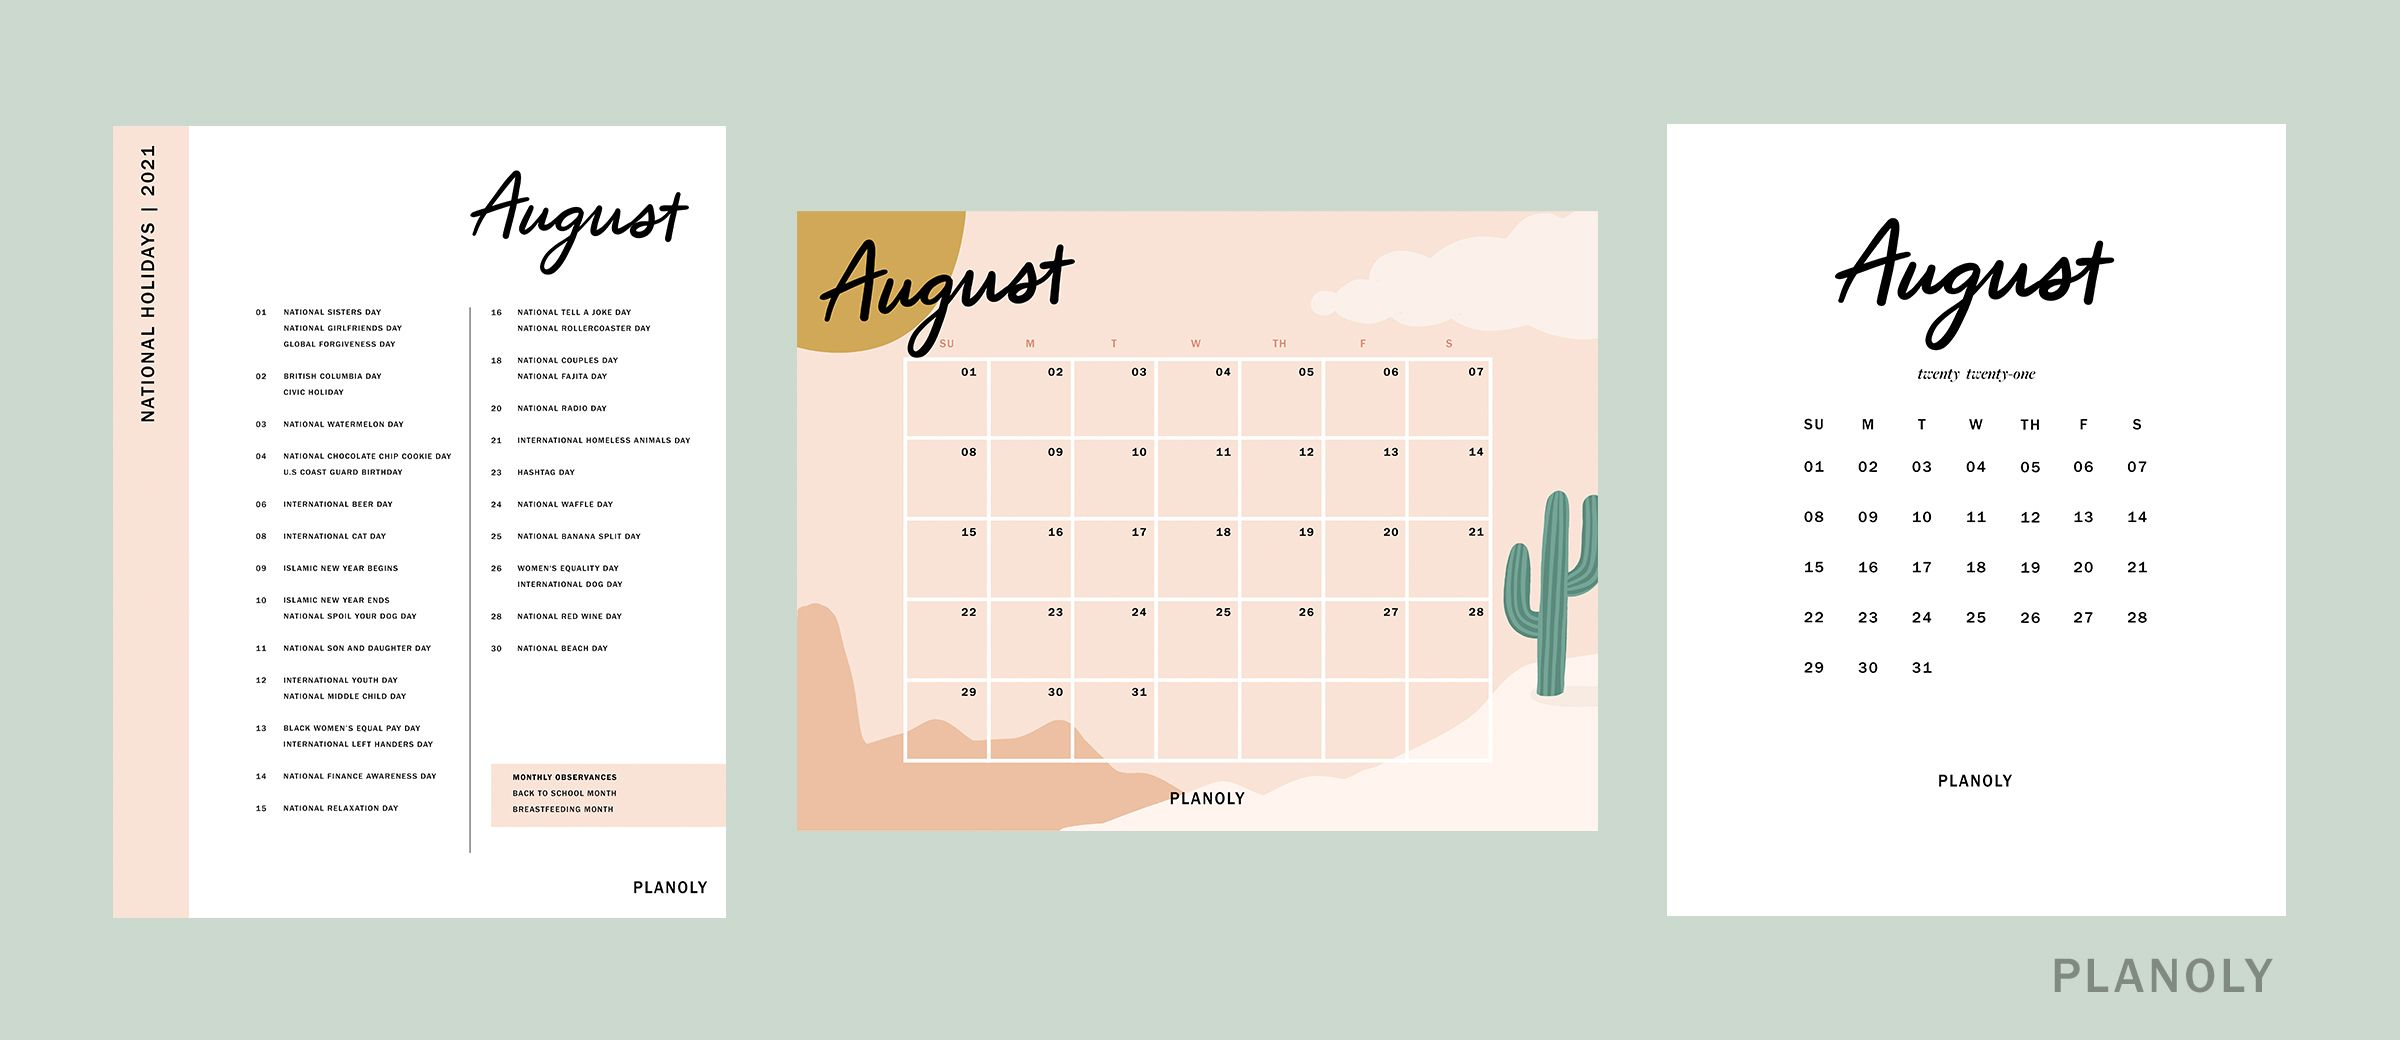 PLANOLY-Blog Post-Q3 Content Calendars-Image 2